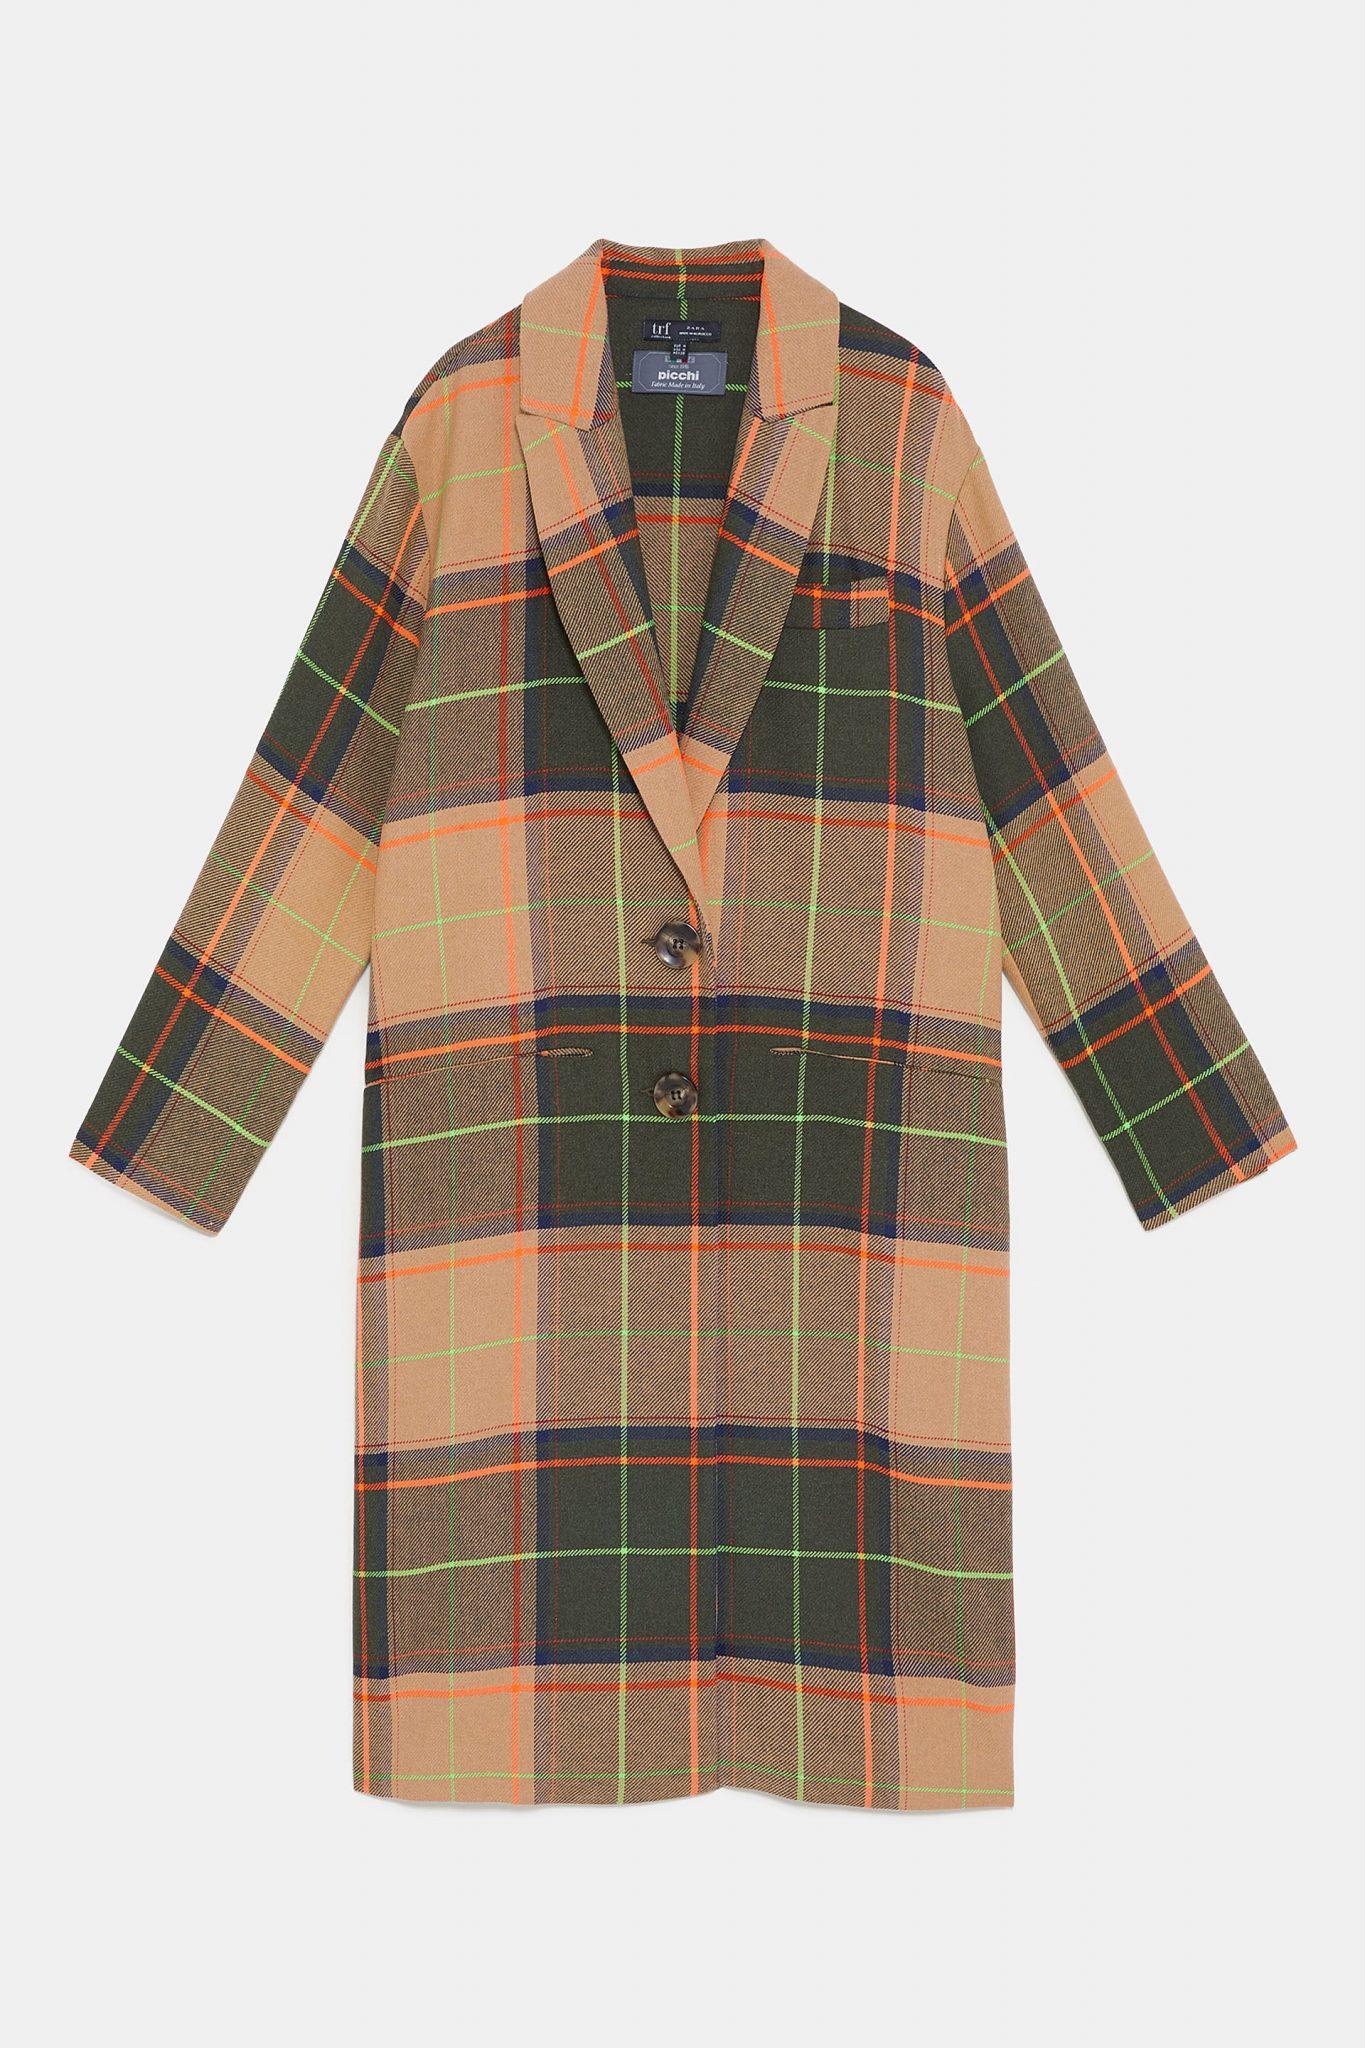 Checkered Coat This Winter